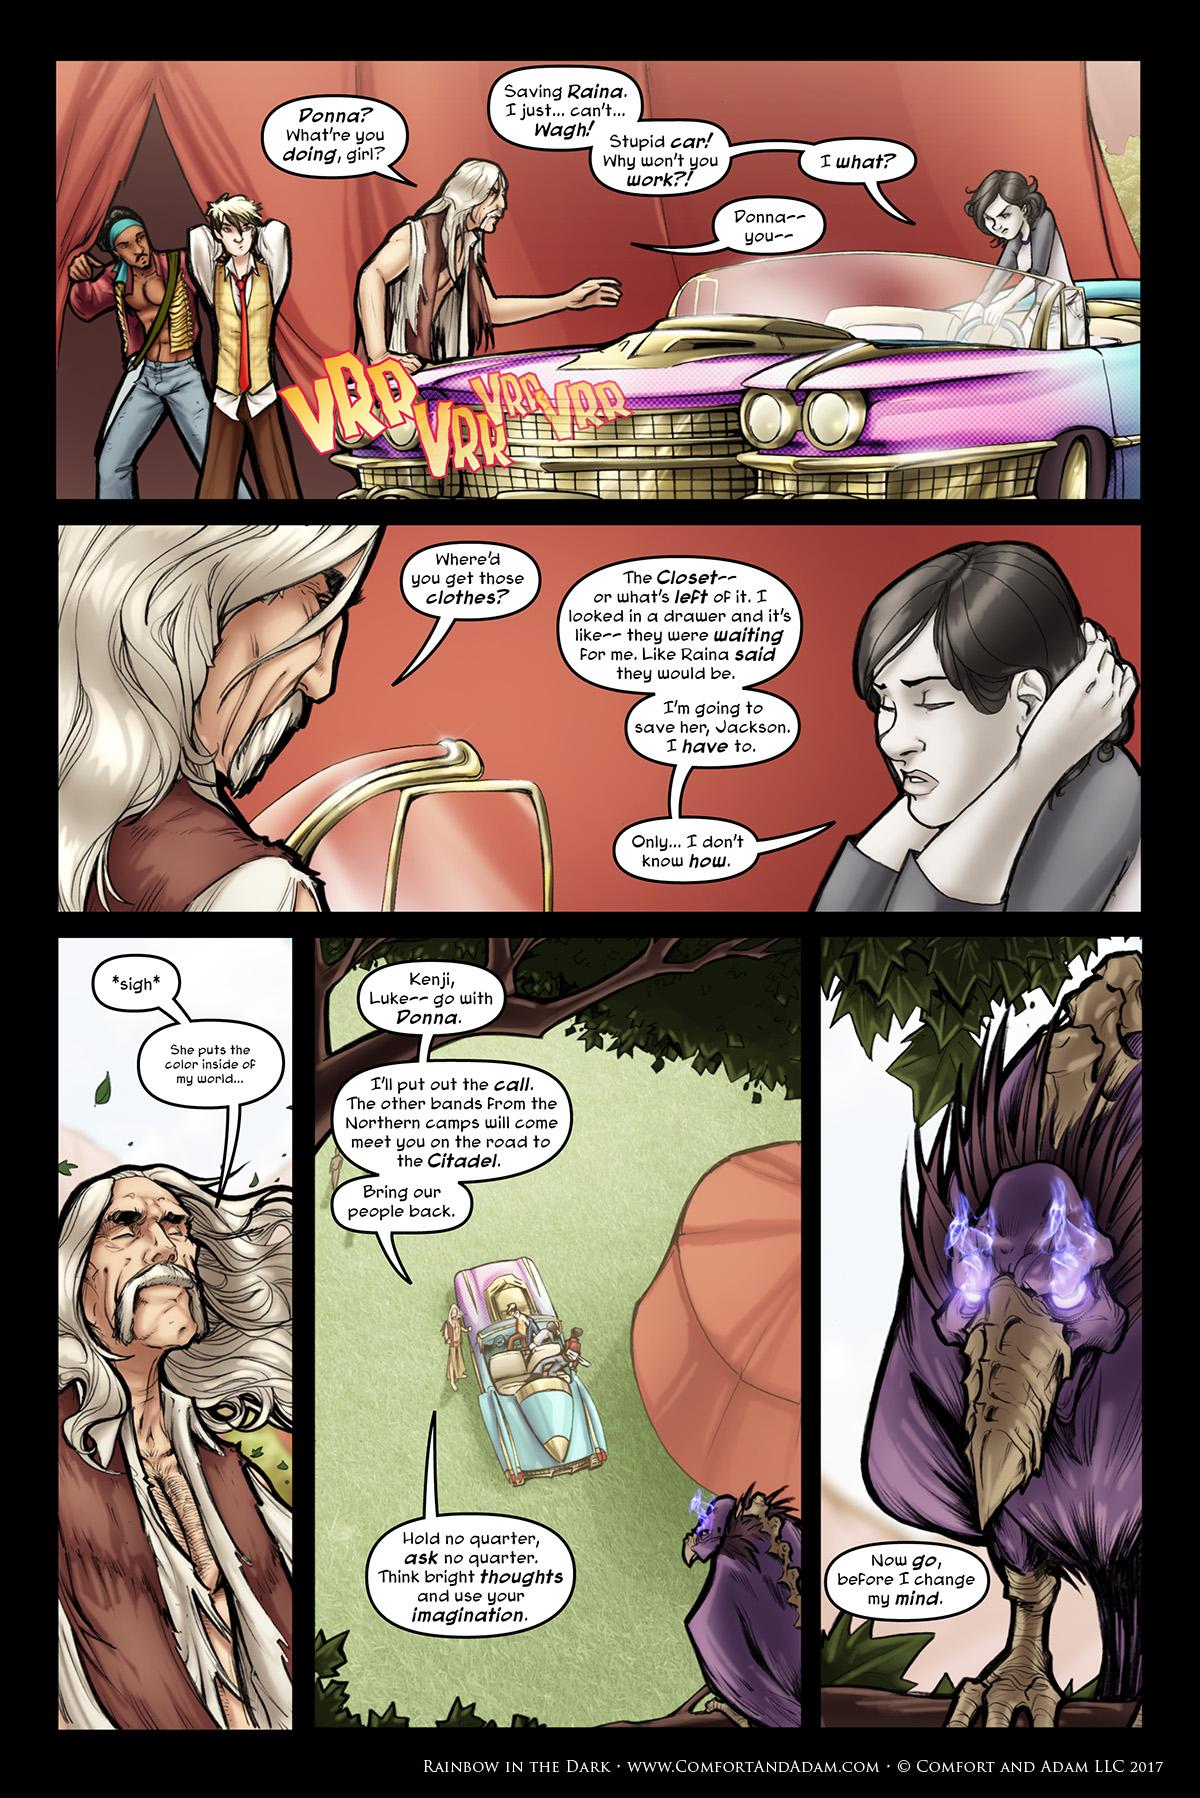 Rainbow in the Dark #3, pg. 5: Donna's Ready to Go